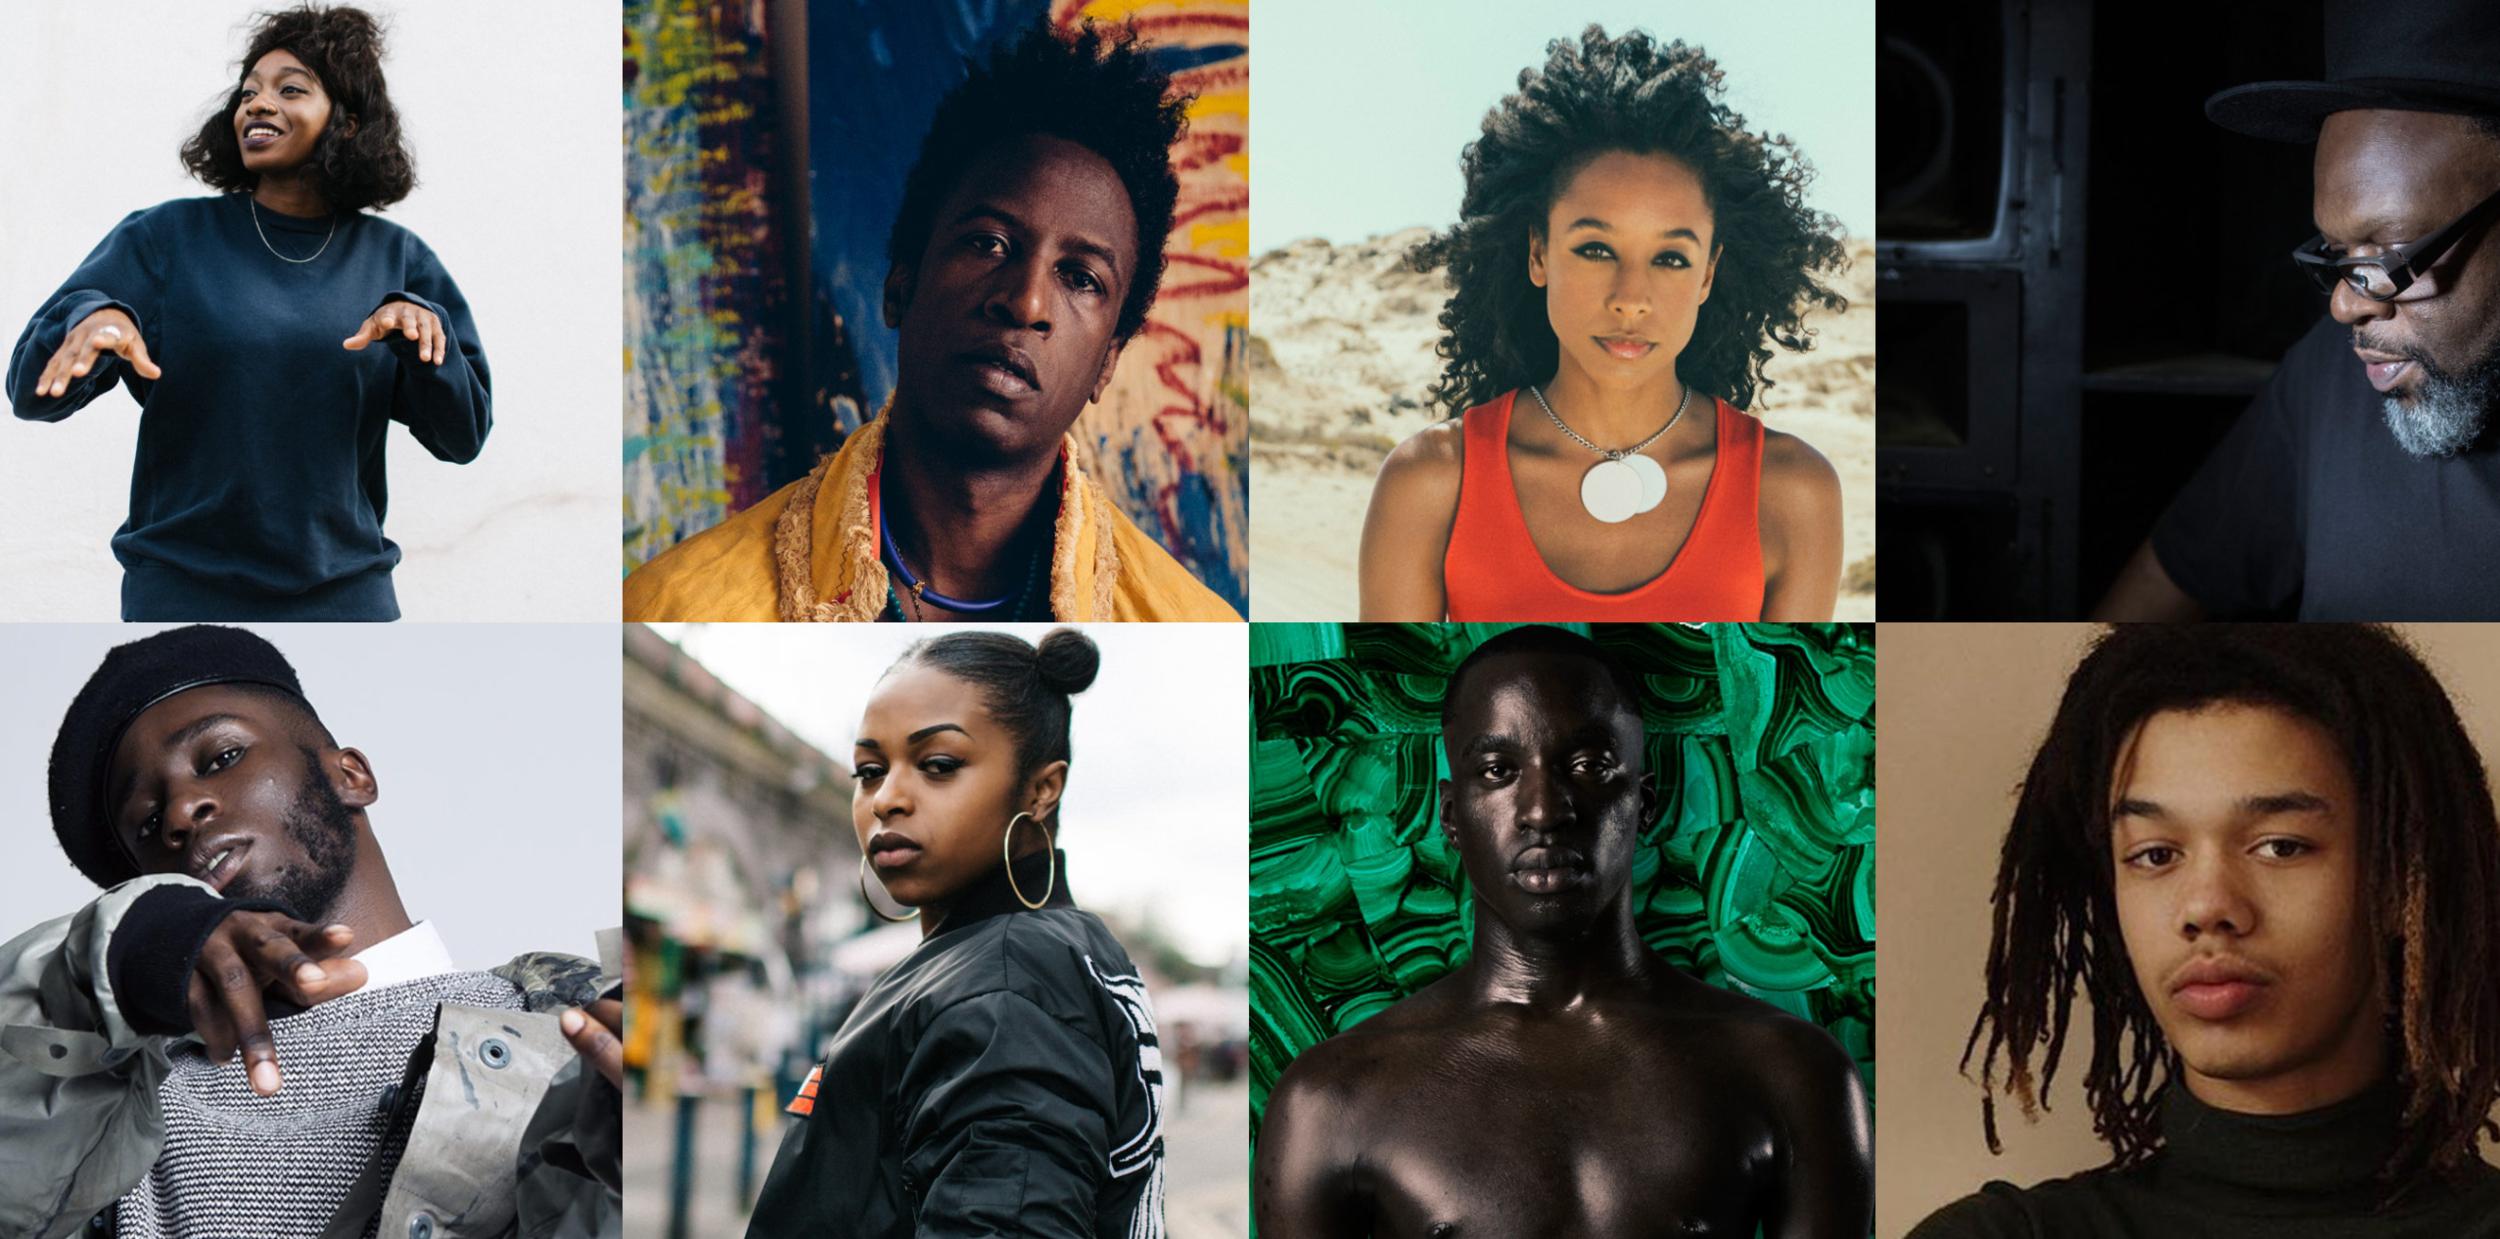 (L2R):  Little Sims;Saul Williams;Corrine Bailey Ray; Jazzie B; Kojey Radical; Nadia Rose; Petite Noir; Cosmo Pyke